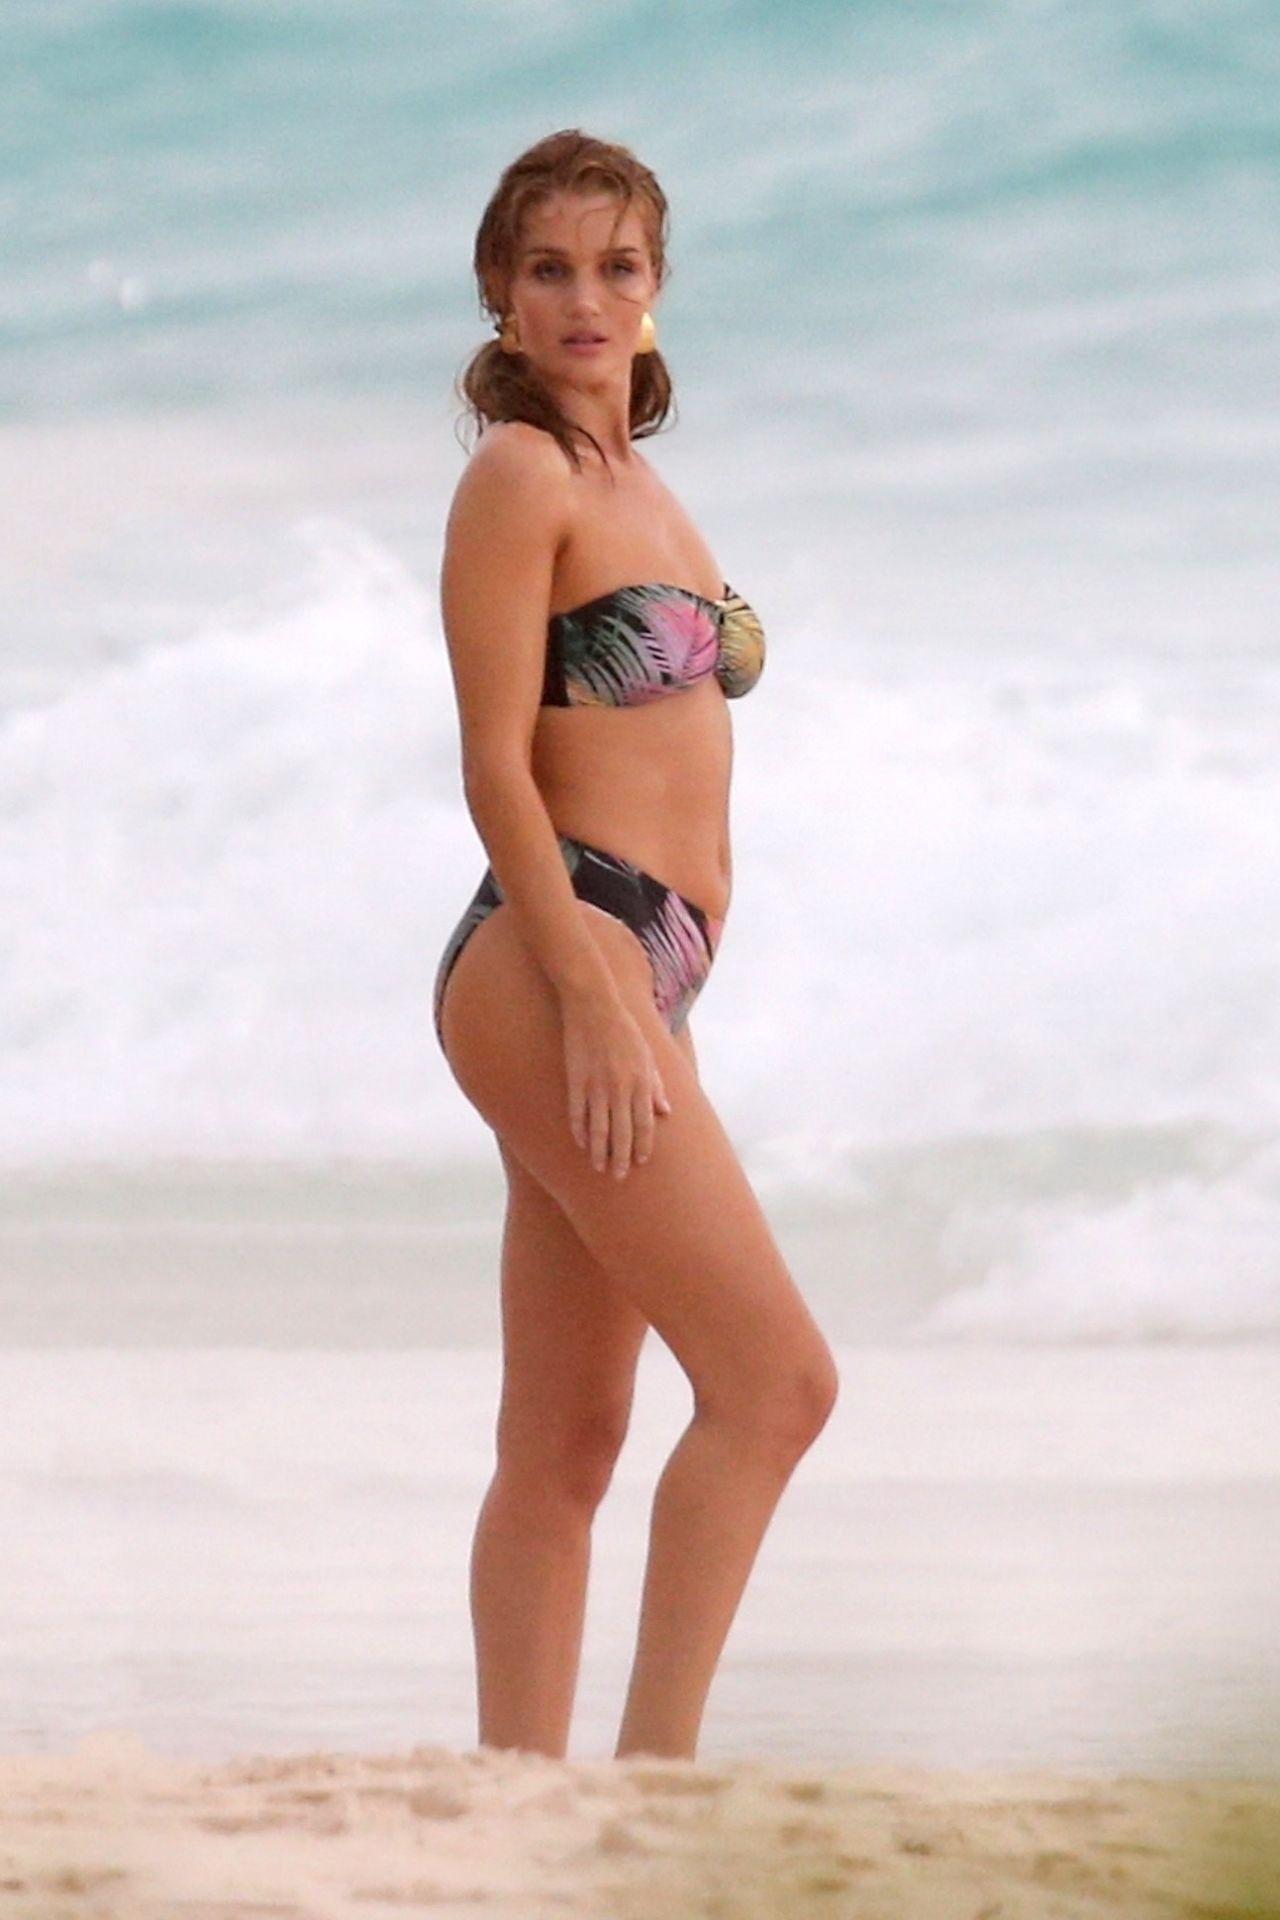 Rosie Huntington Whiteley Shooting A New Bikini